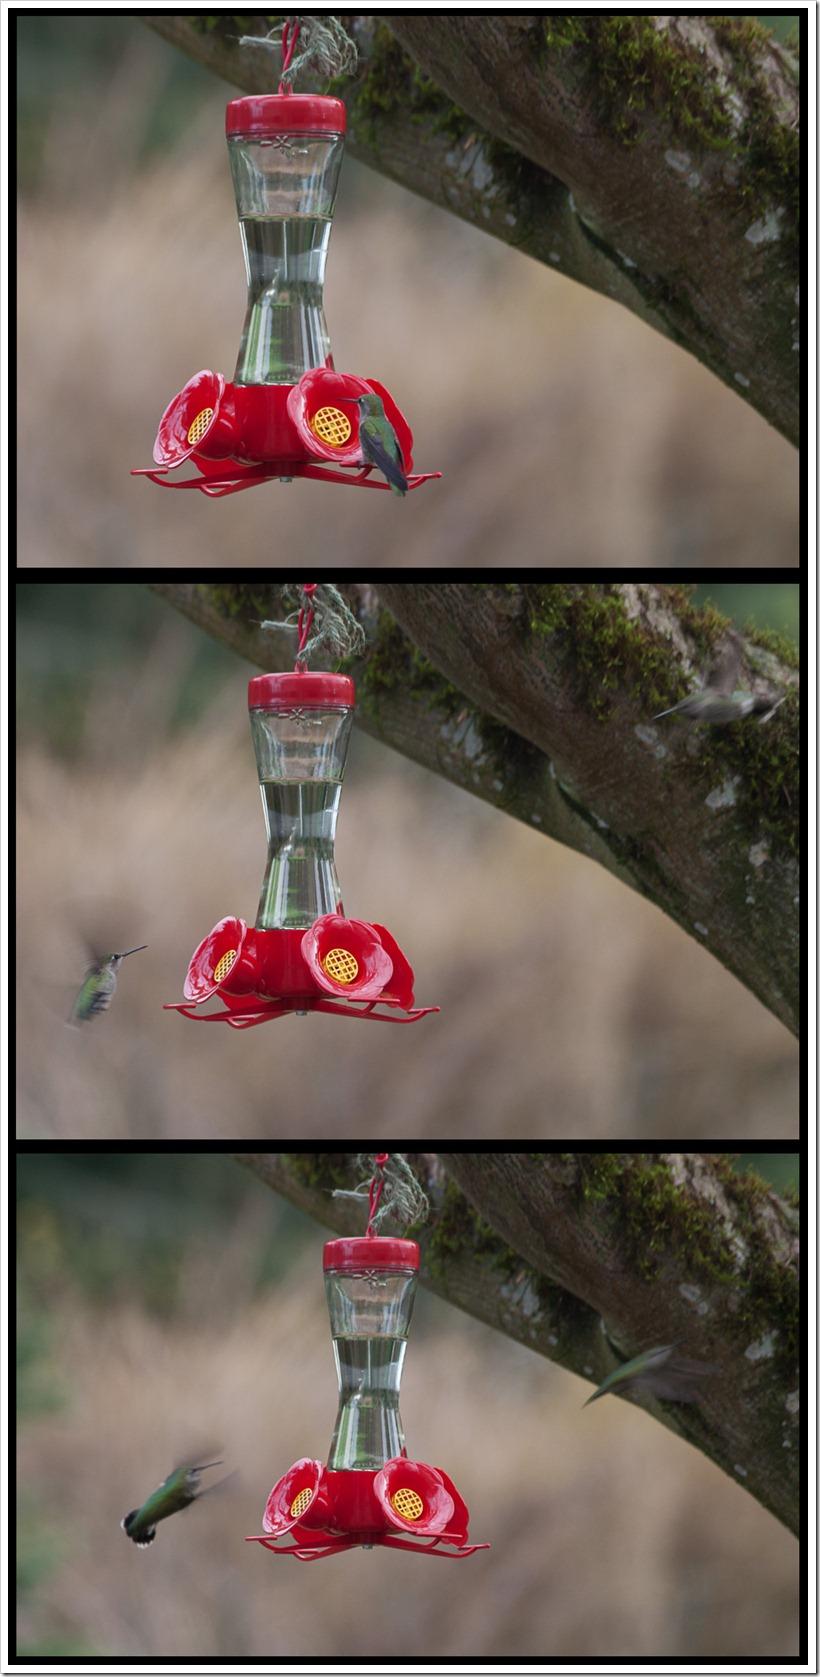 dualinghummingbirds